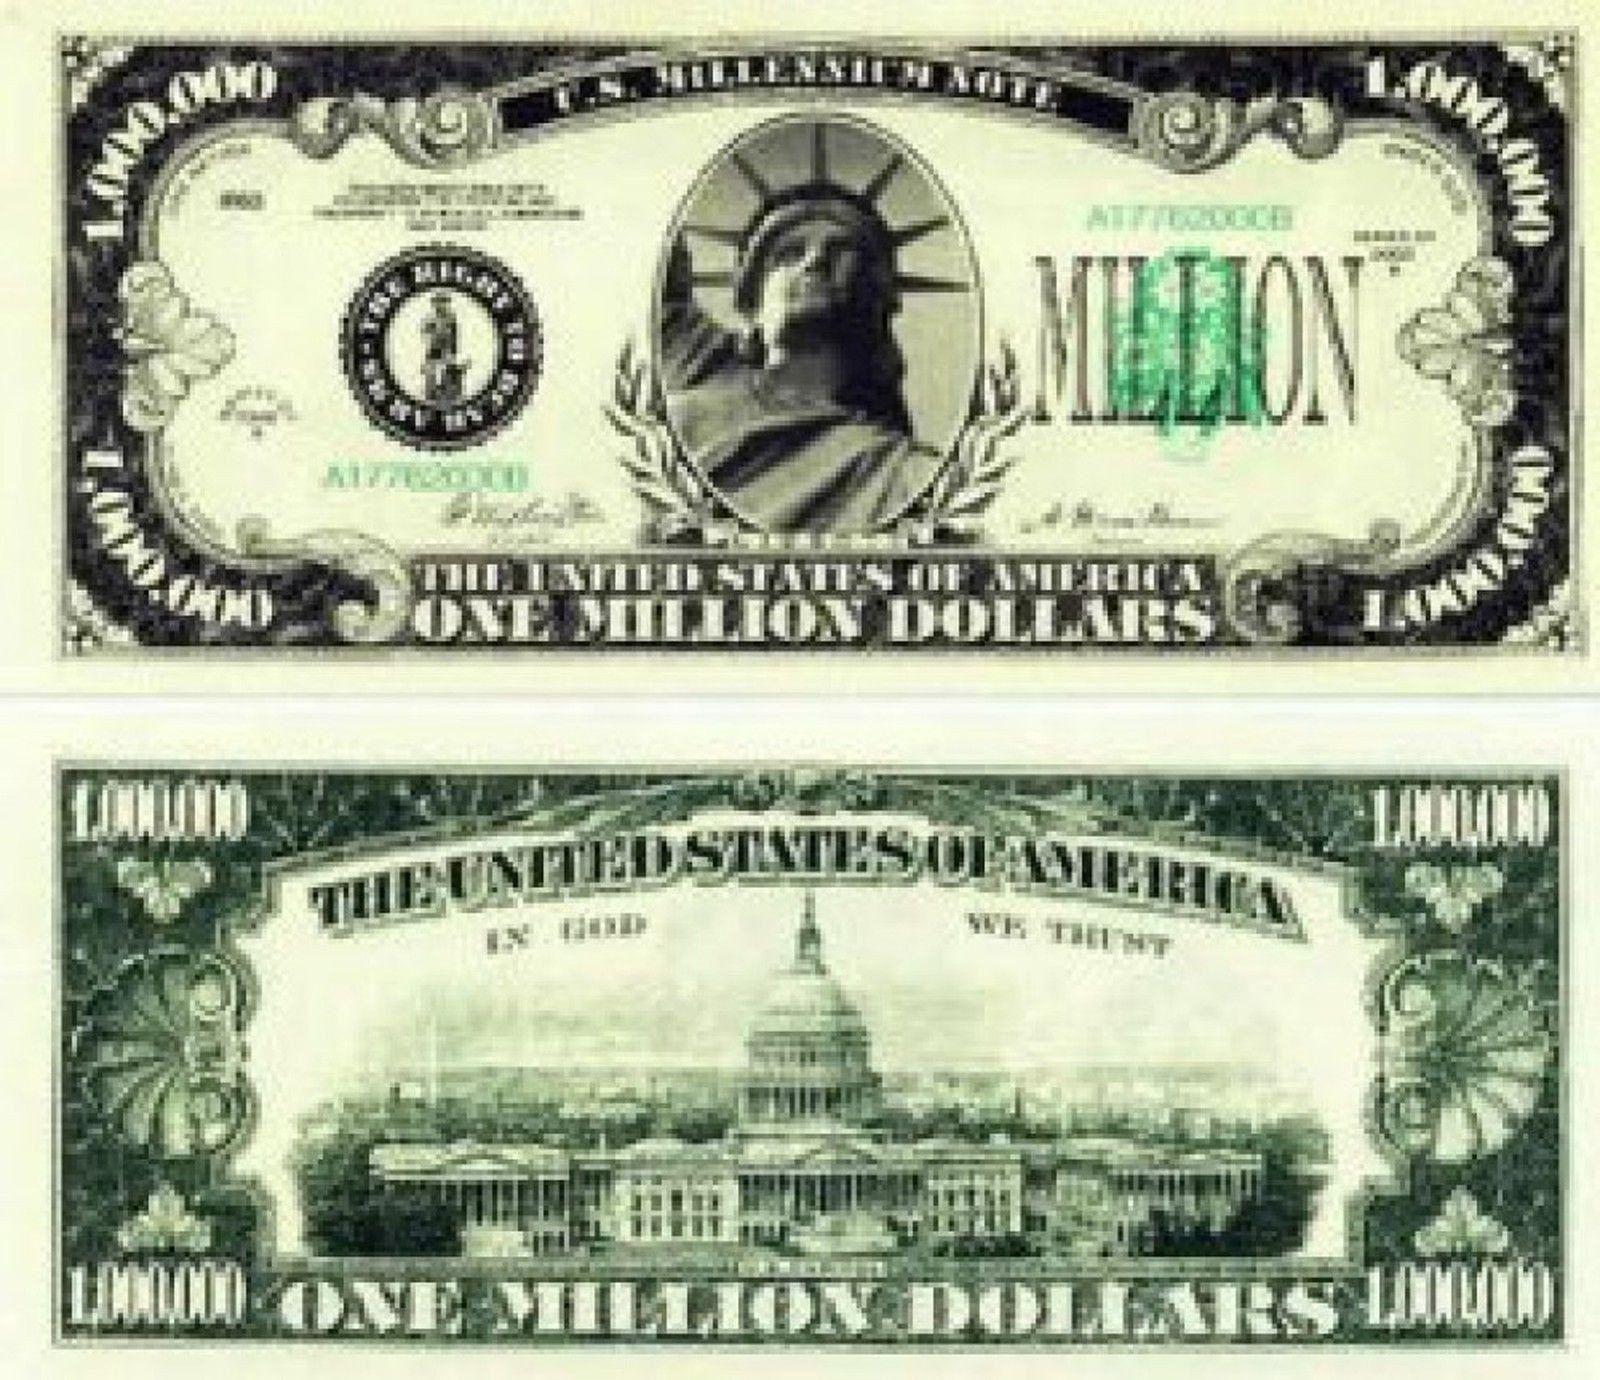 Set Of 100 Million Dollar Bills Very Realistic Looking Same Size As Real Mone Dollar Bill 100 Million Dollars Dollar Money